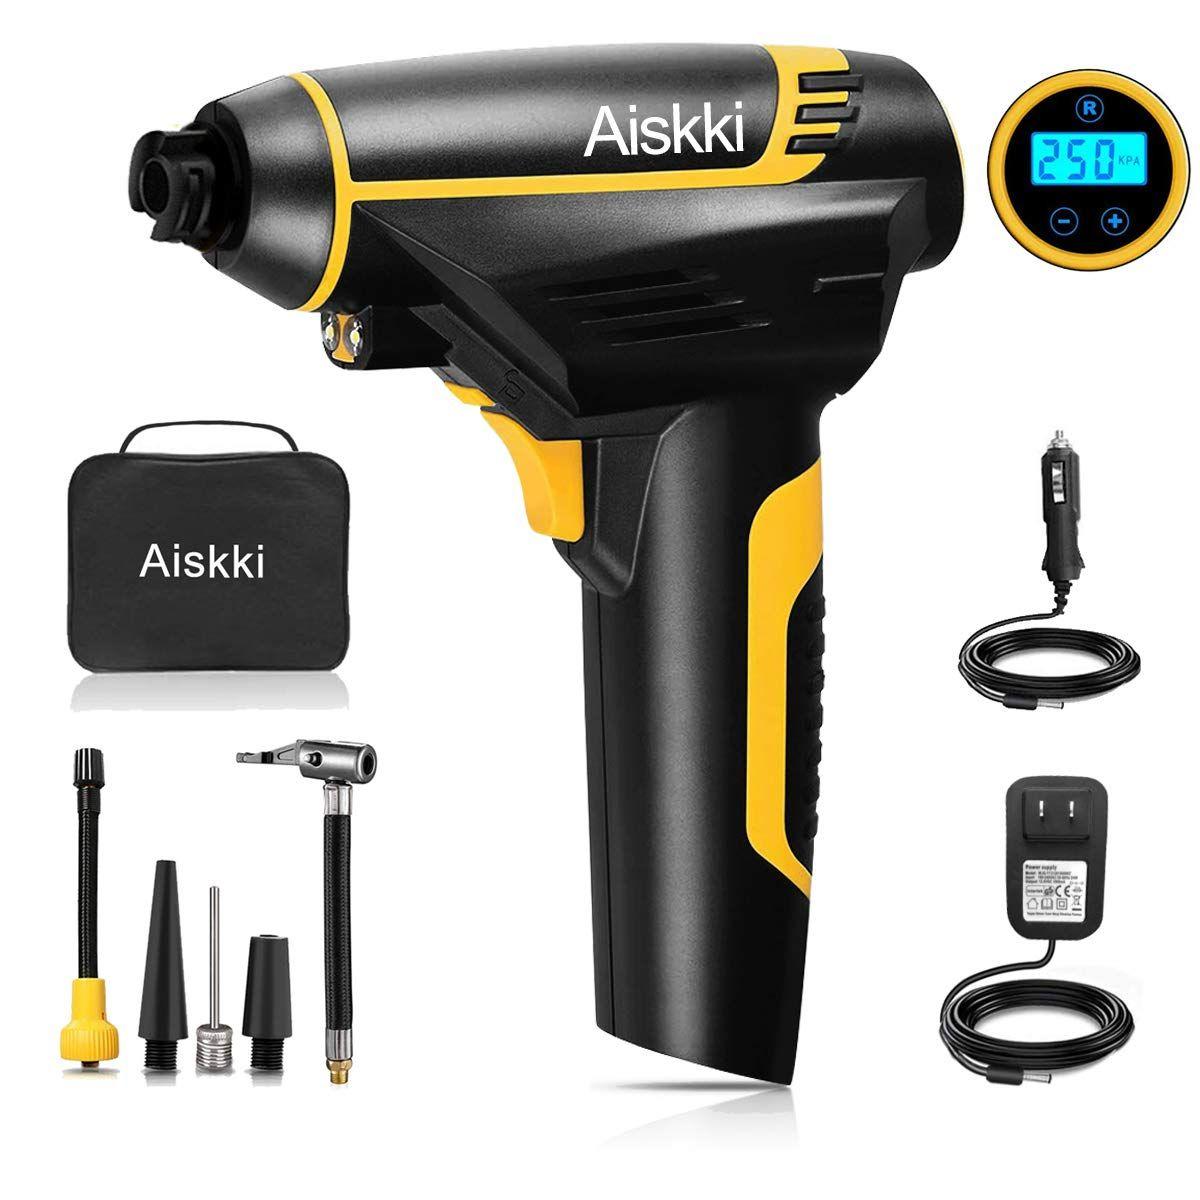 Aiskki Digital Cordless Inflator, Portable Tire Hand Held